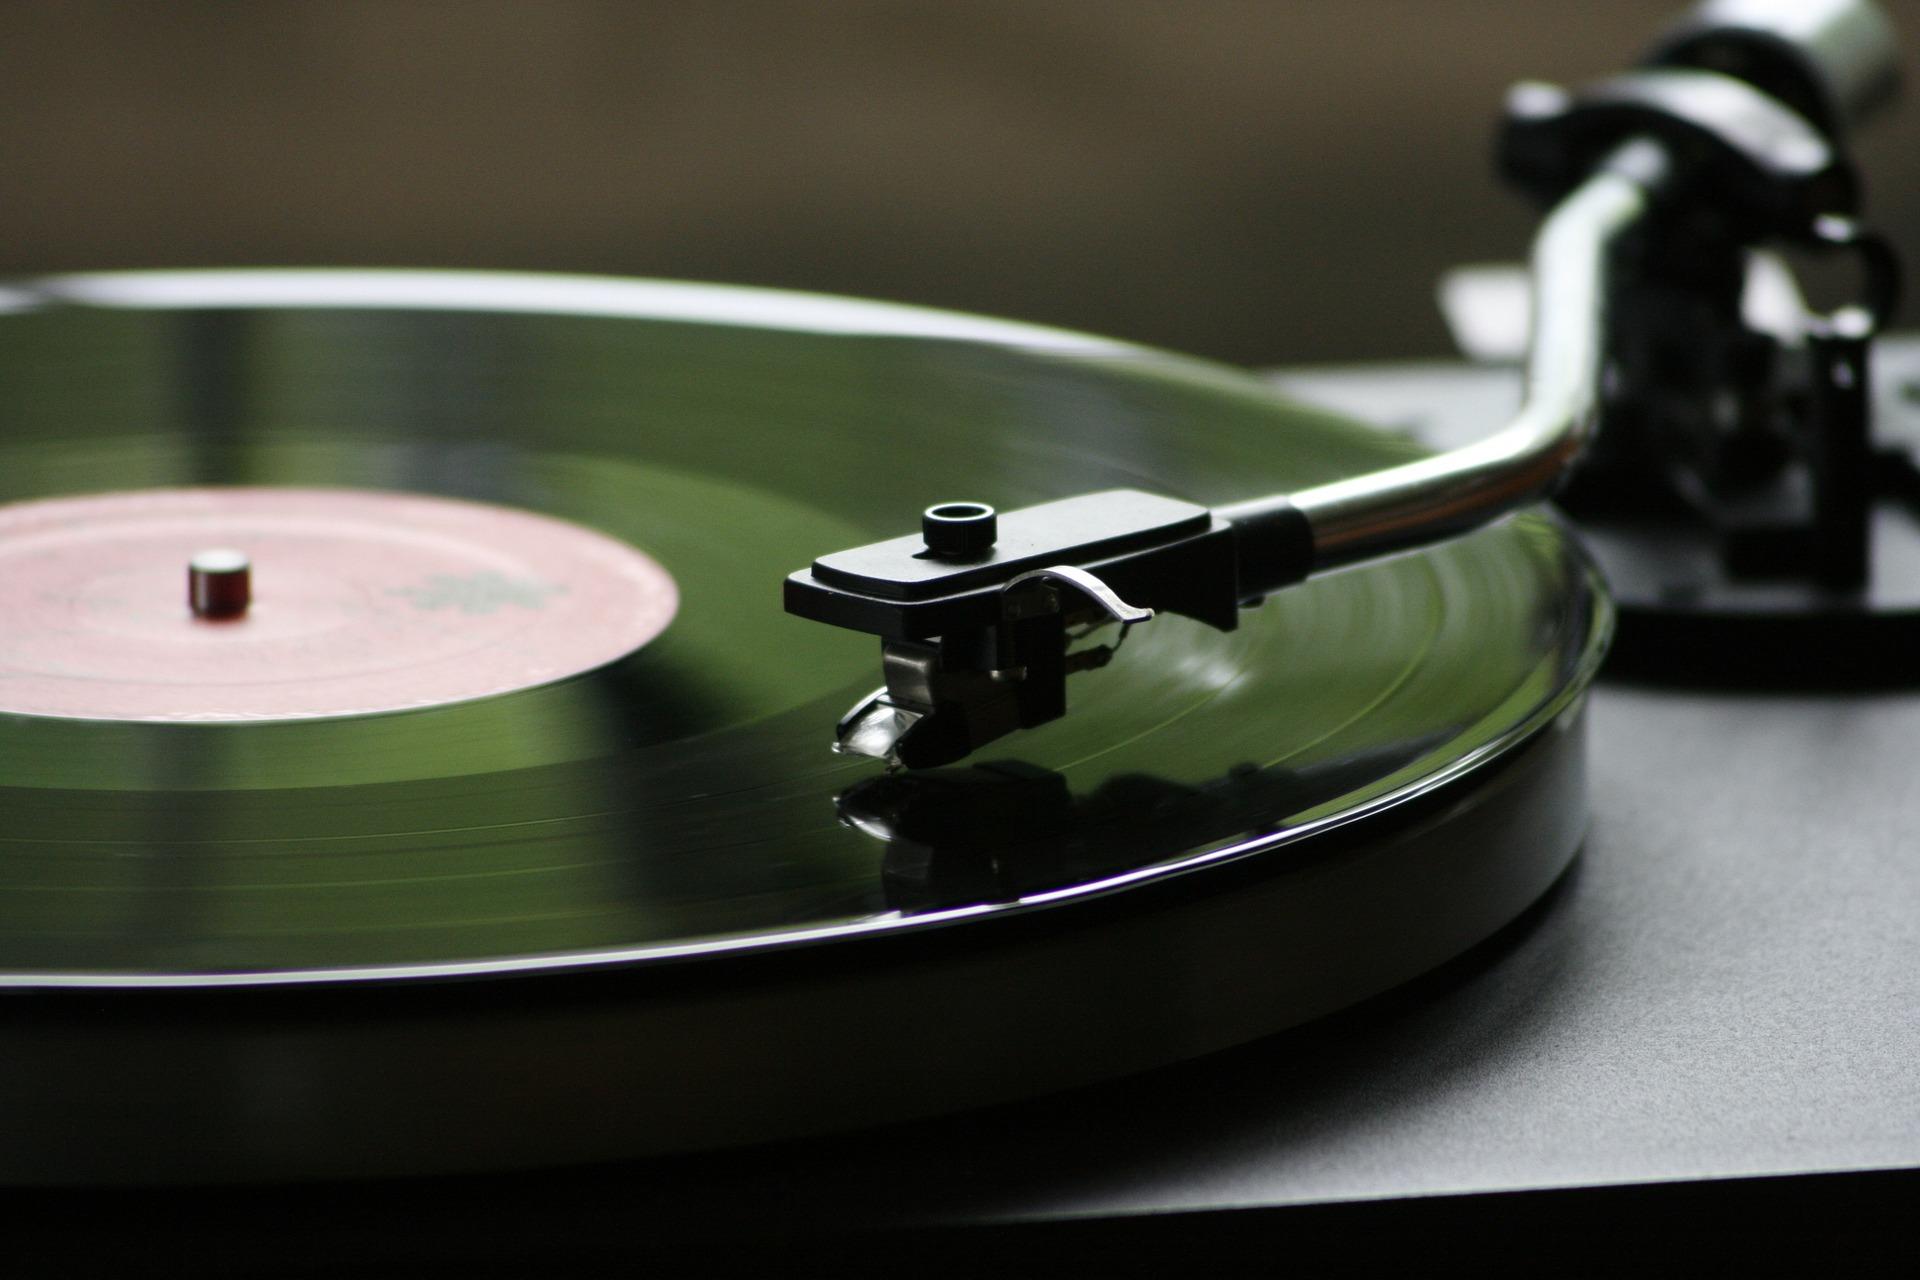 Trendthema Vinyl: Die Renaissance der Schallplatte | lounge.concerti.de